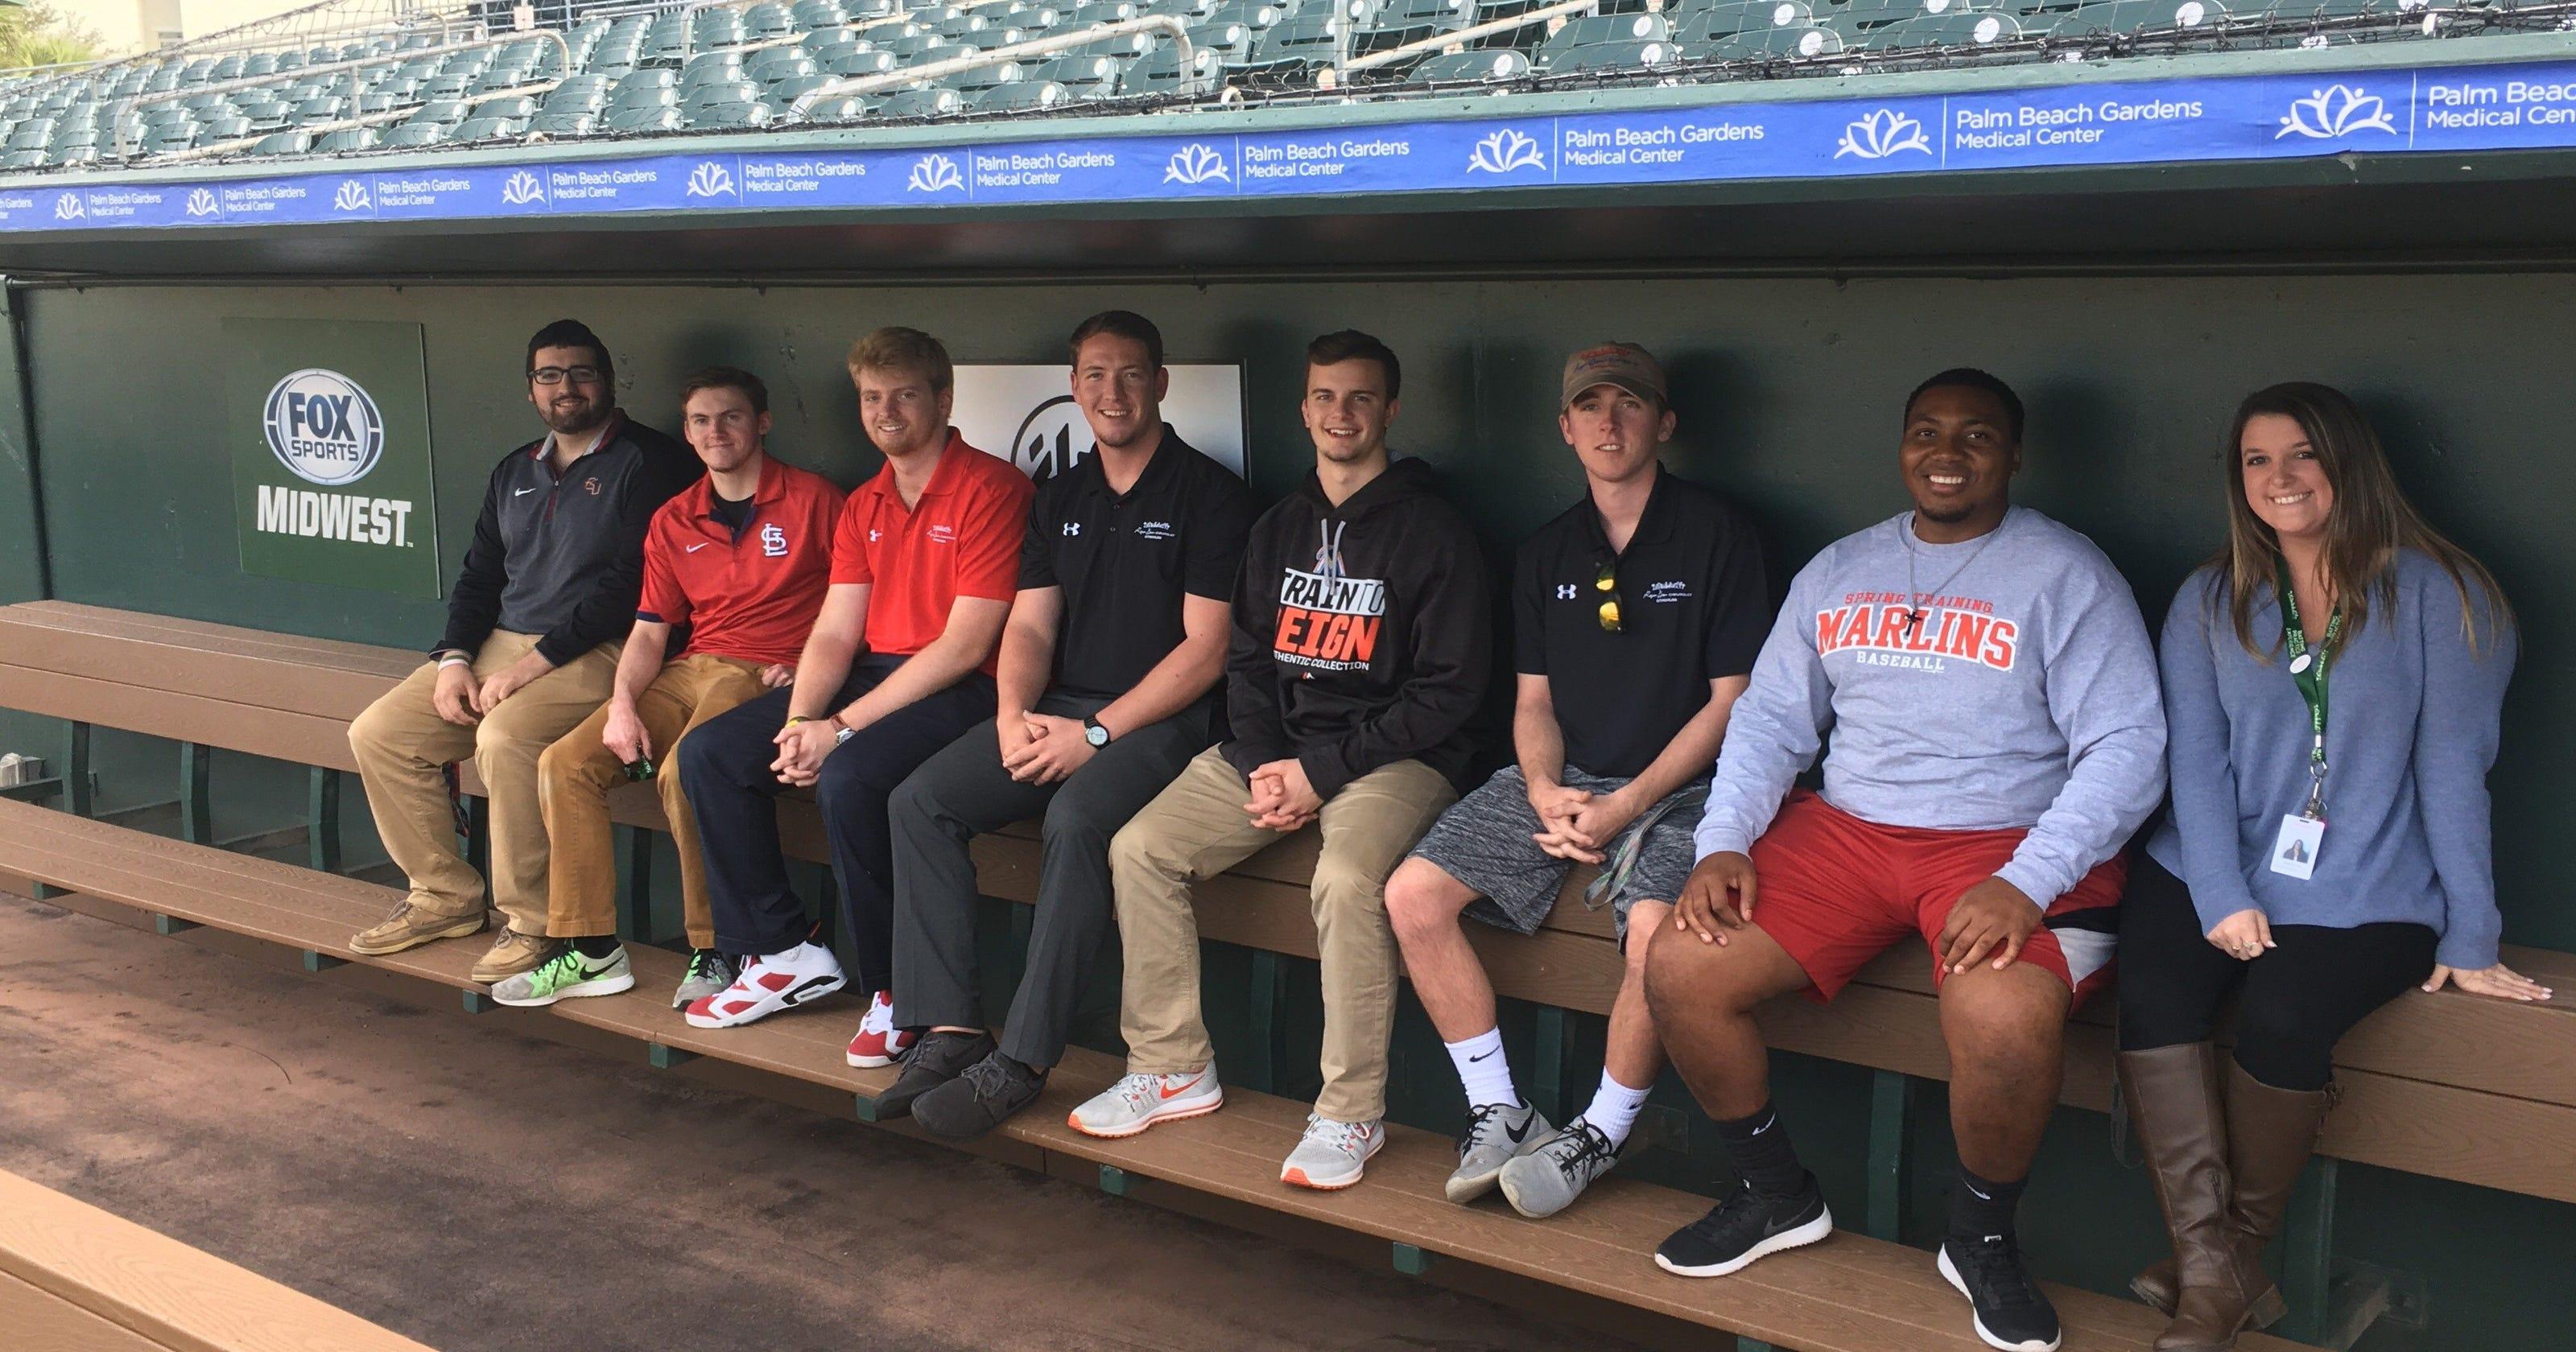 Roger Dean Chevrolet Stadium sees Hamerheads, Cardinals